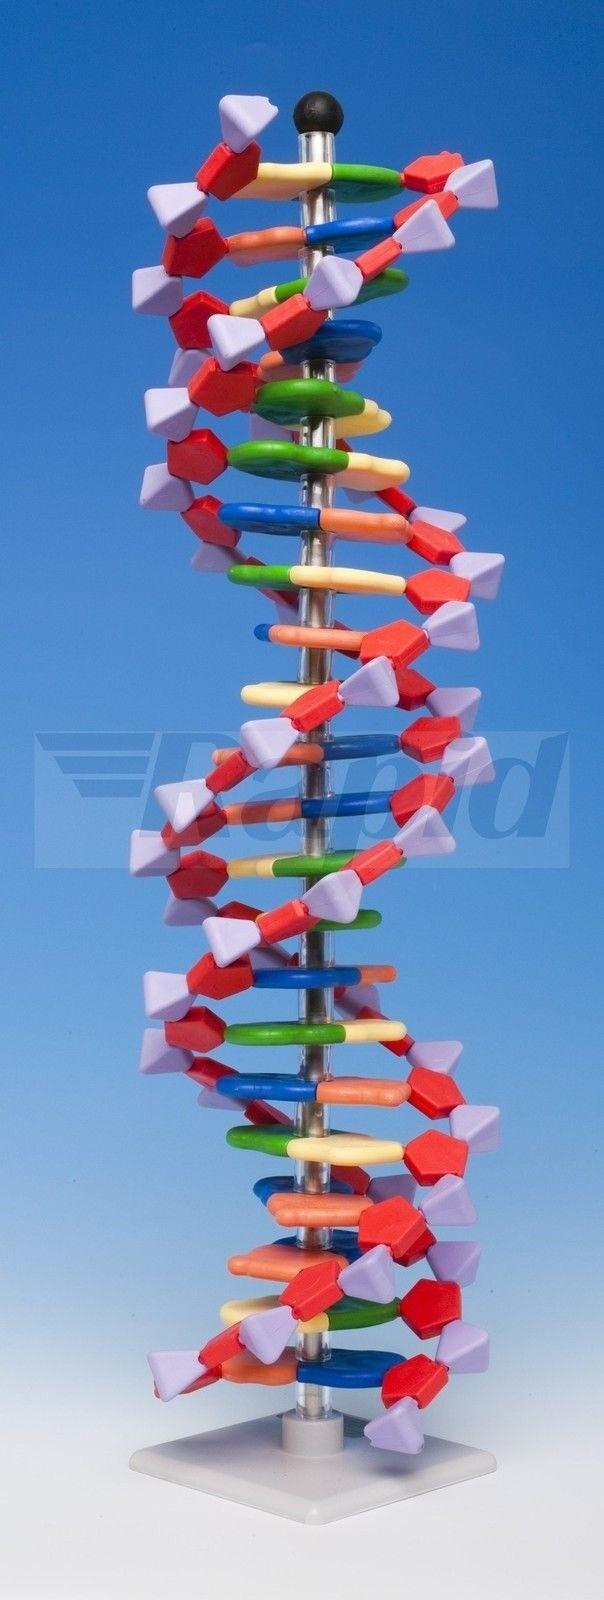 Molymod DNA-060-22 - MiniDNA Advanced 22 Layer Molecular Model Kit - 440mm High